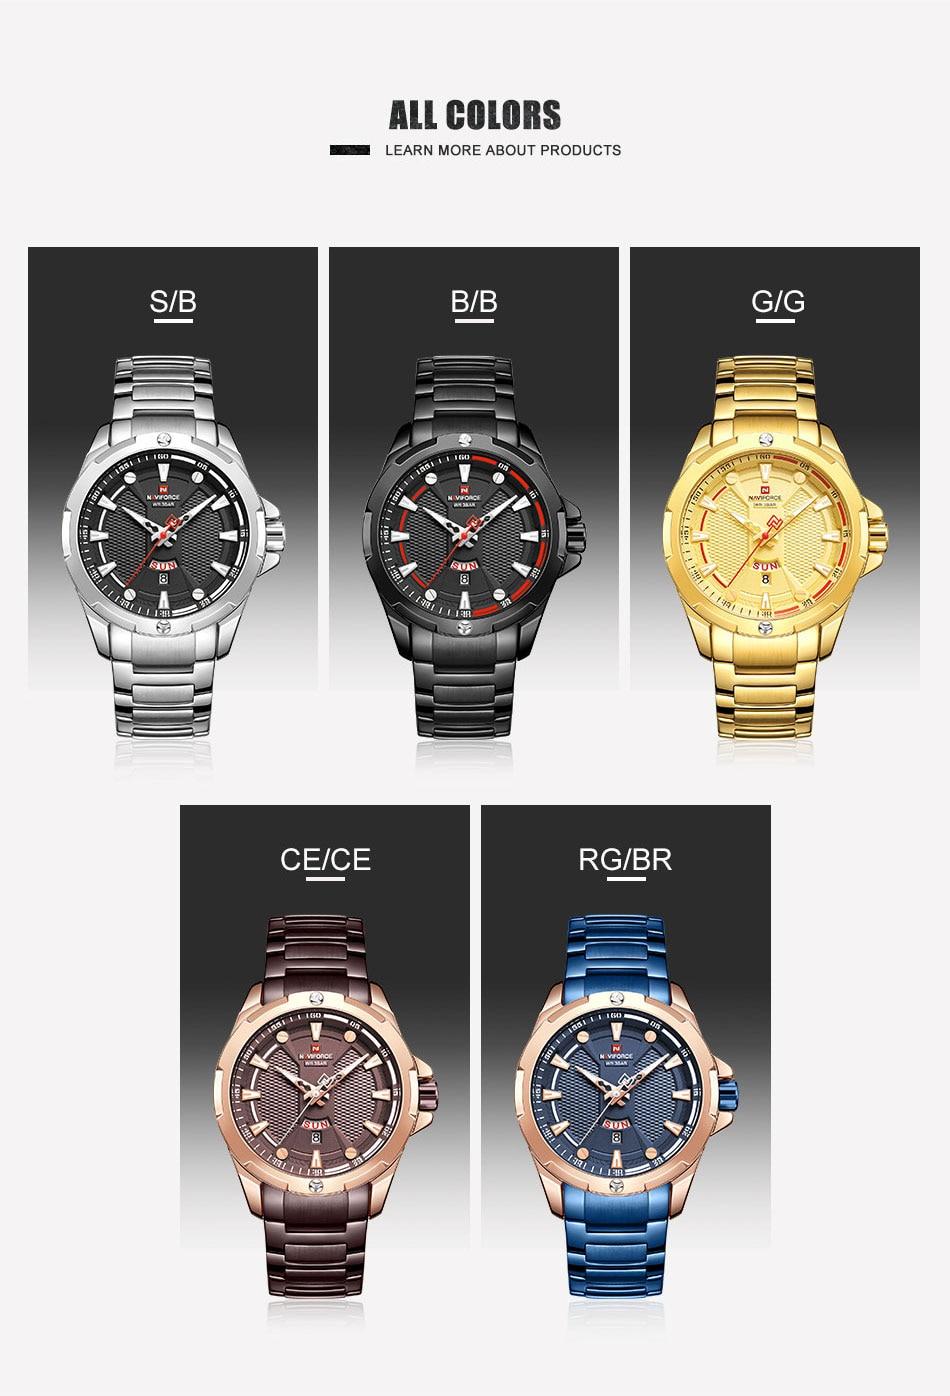 H8af3cf15820041f7922ce1050621ad78B Men's Watches Top Luxury Brand NAVIFORCE Analog Watch Men Stainless Steel Waterproof Quartz Wristwatch Date Relogio Masculino